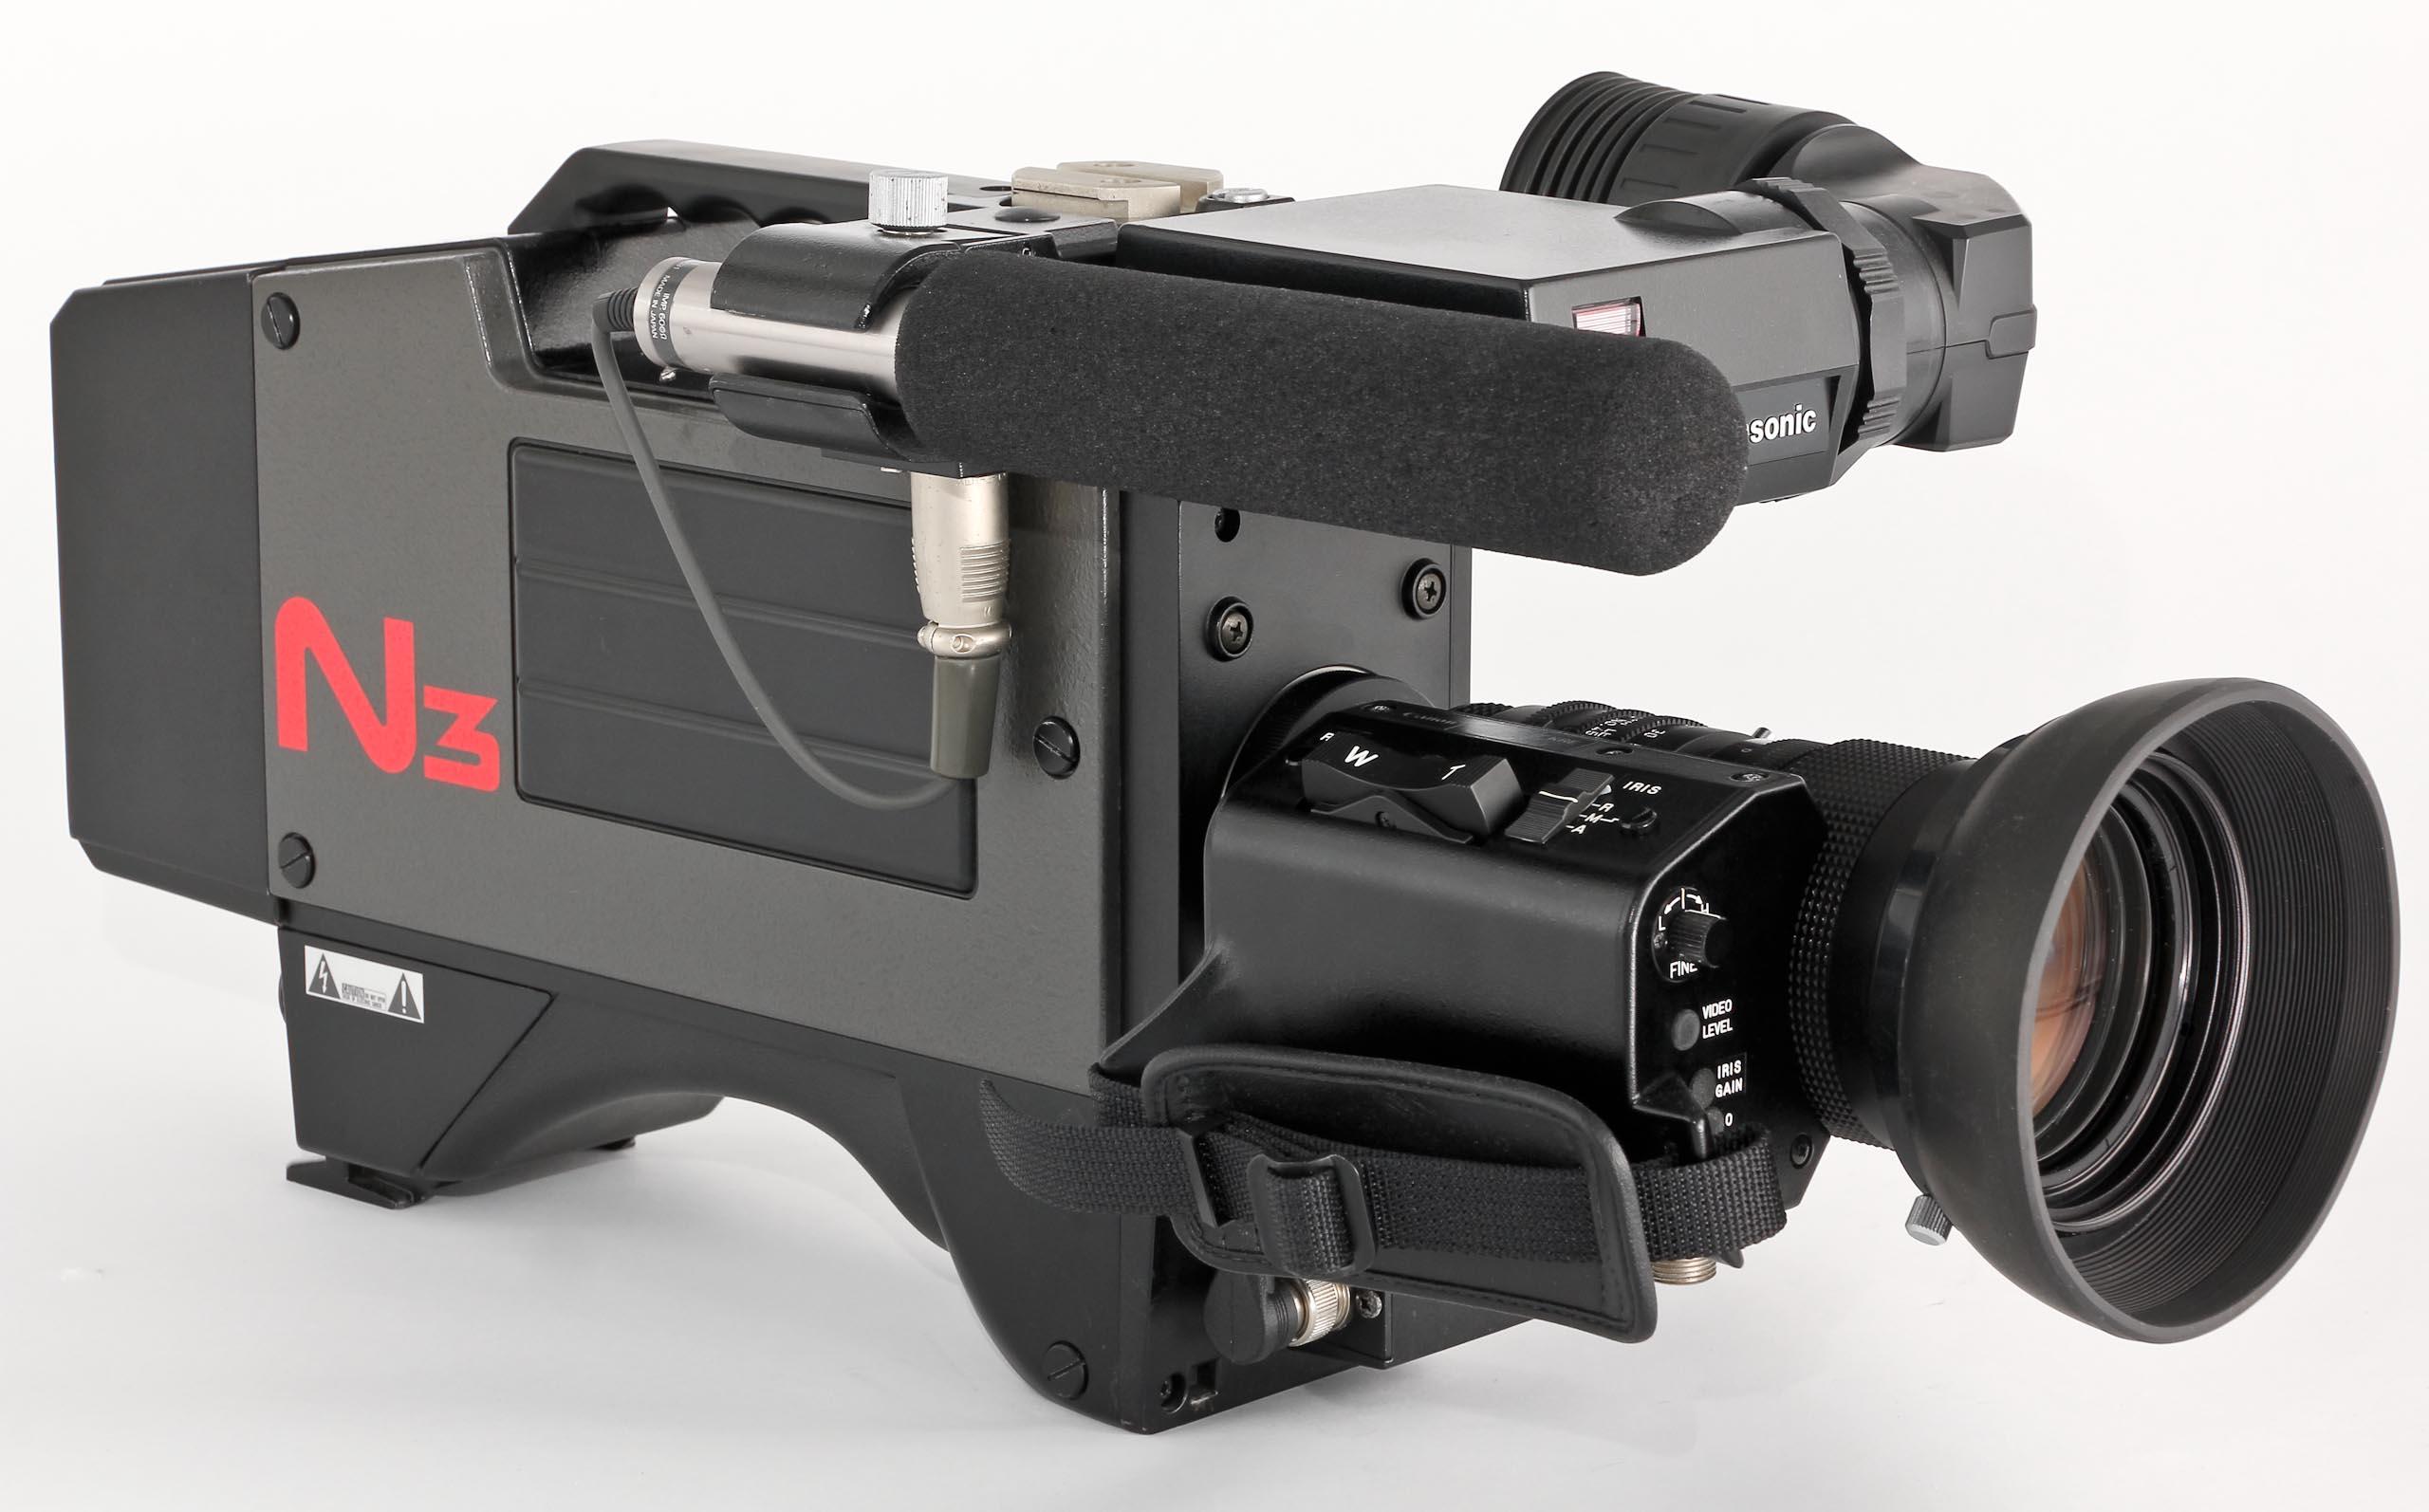 Panasonic-WV-N3 - 4